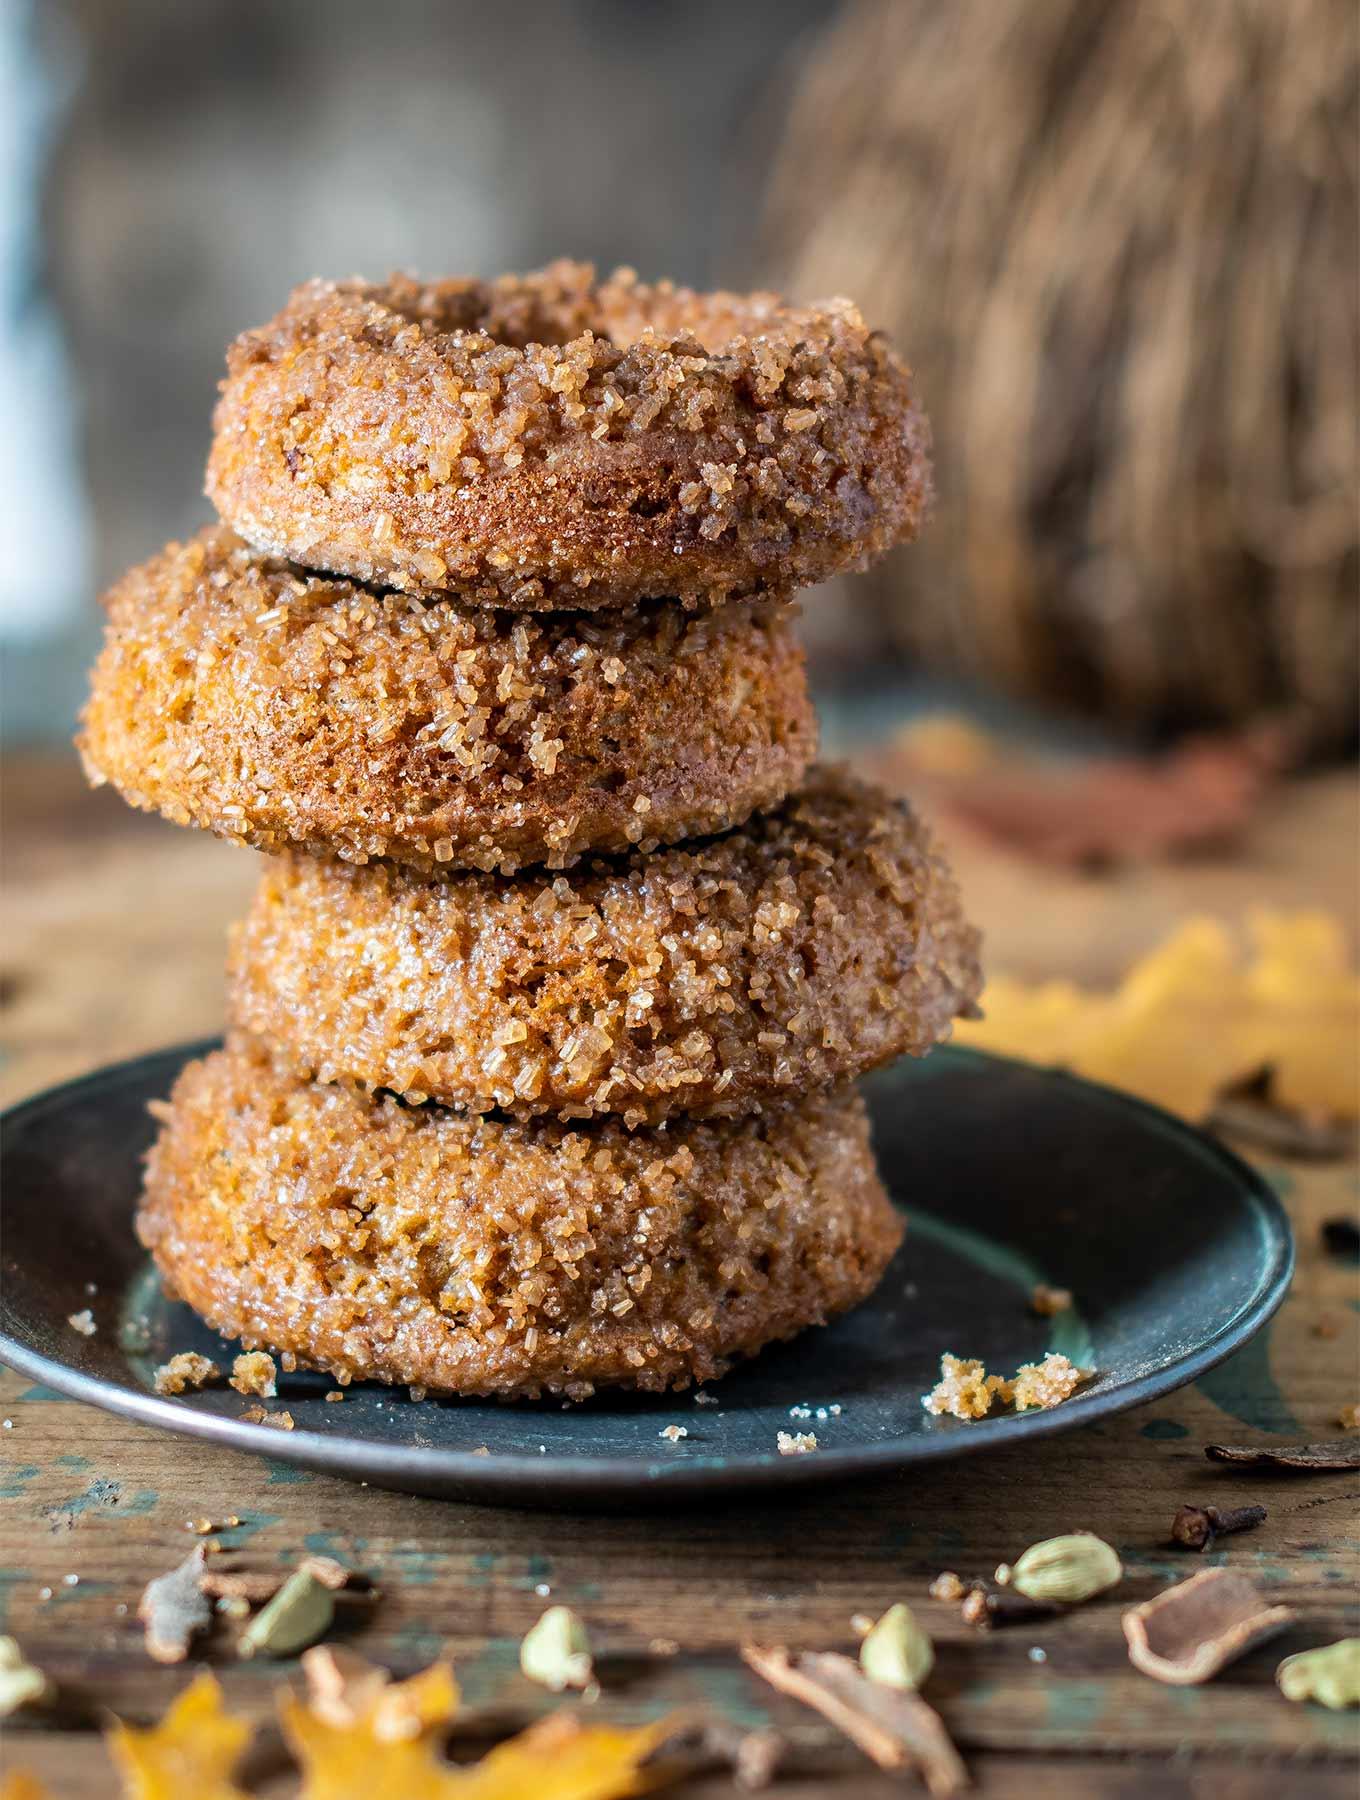 stack of sugared cardamom donuts